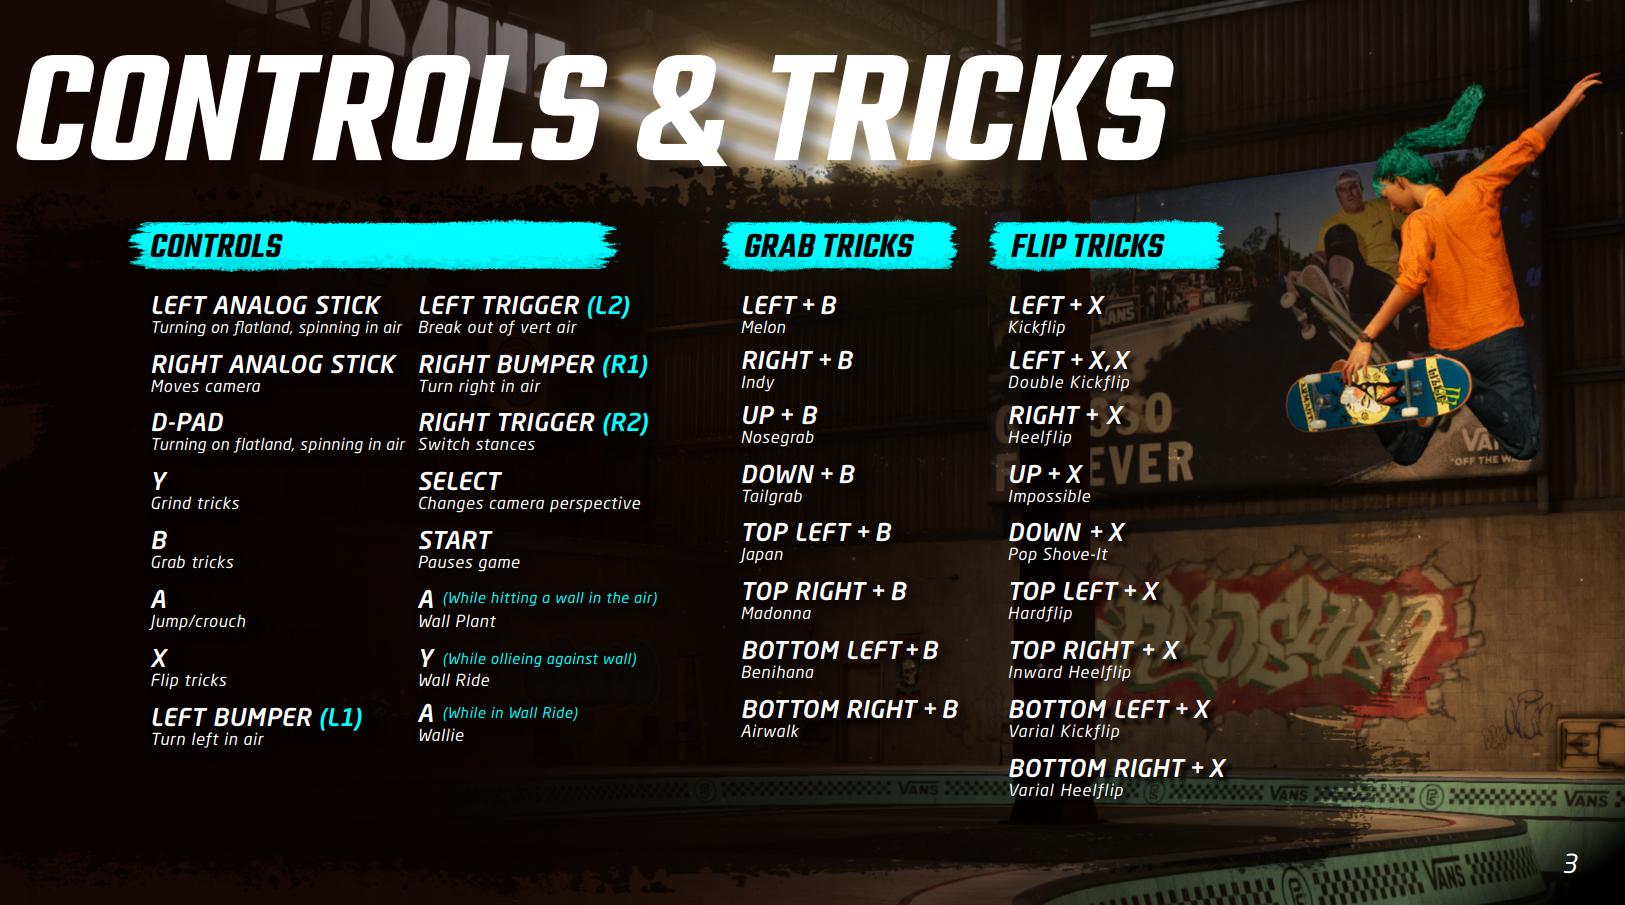 Tony Hawk's Pro Skater 1+2 tricks and combos